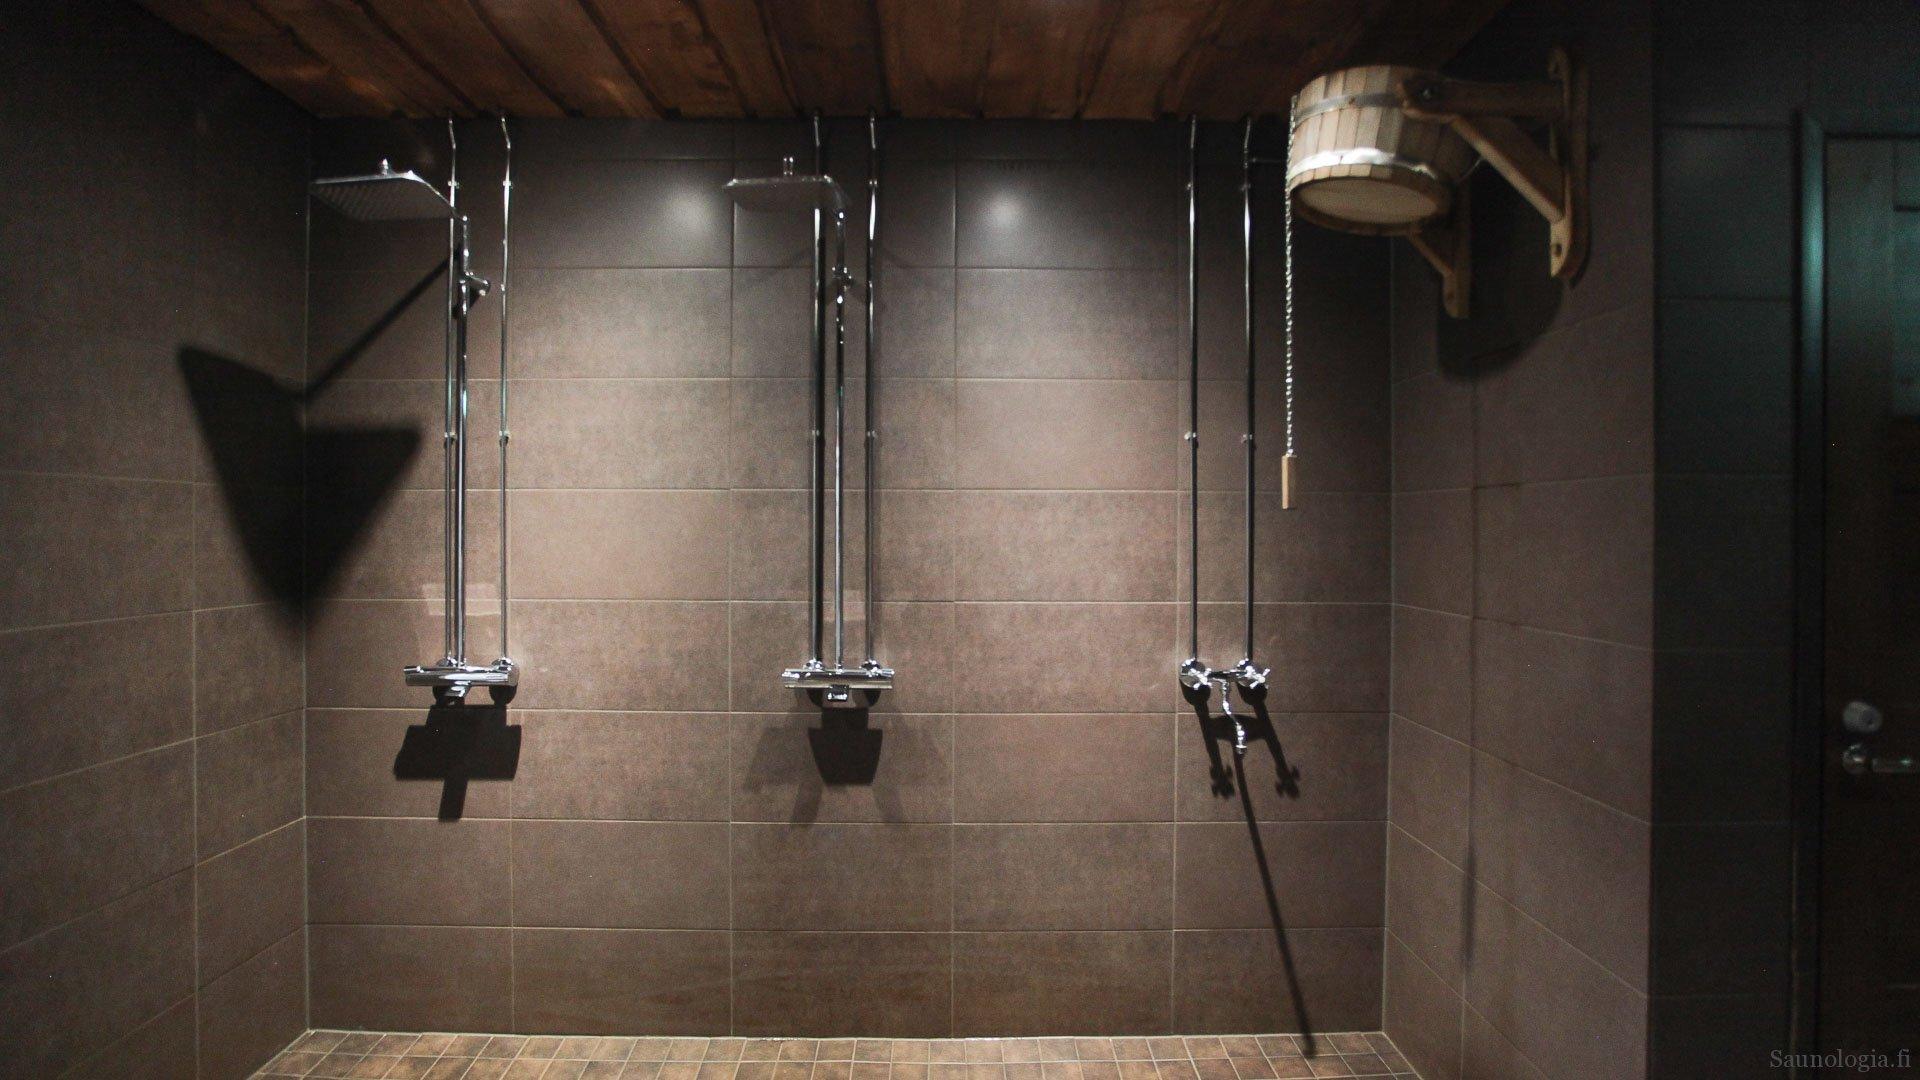 170831-tykkimaen-sauna-saunan-suihkut